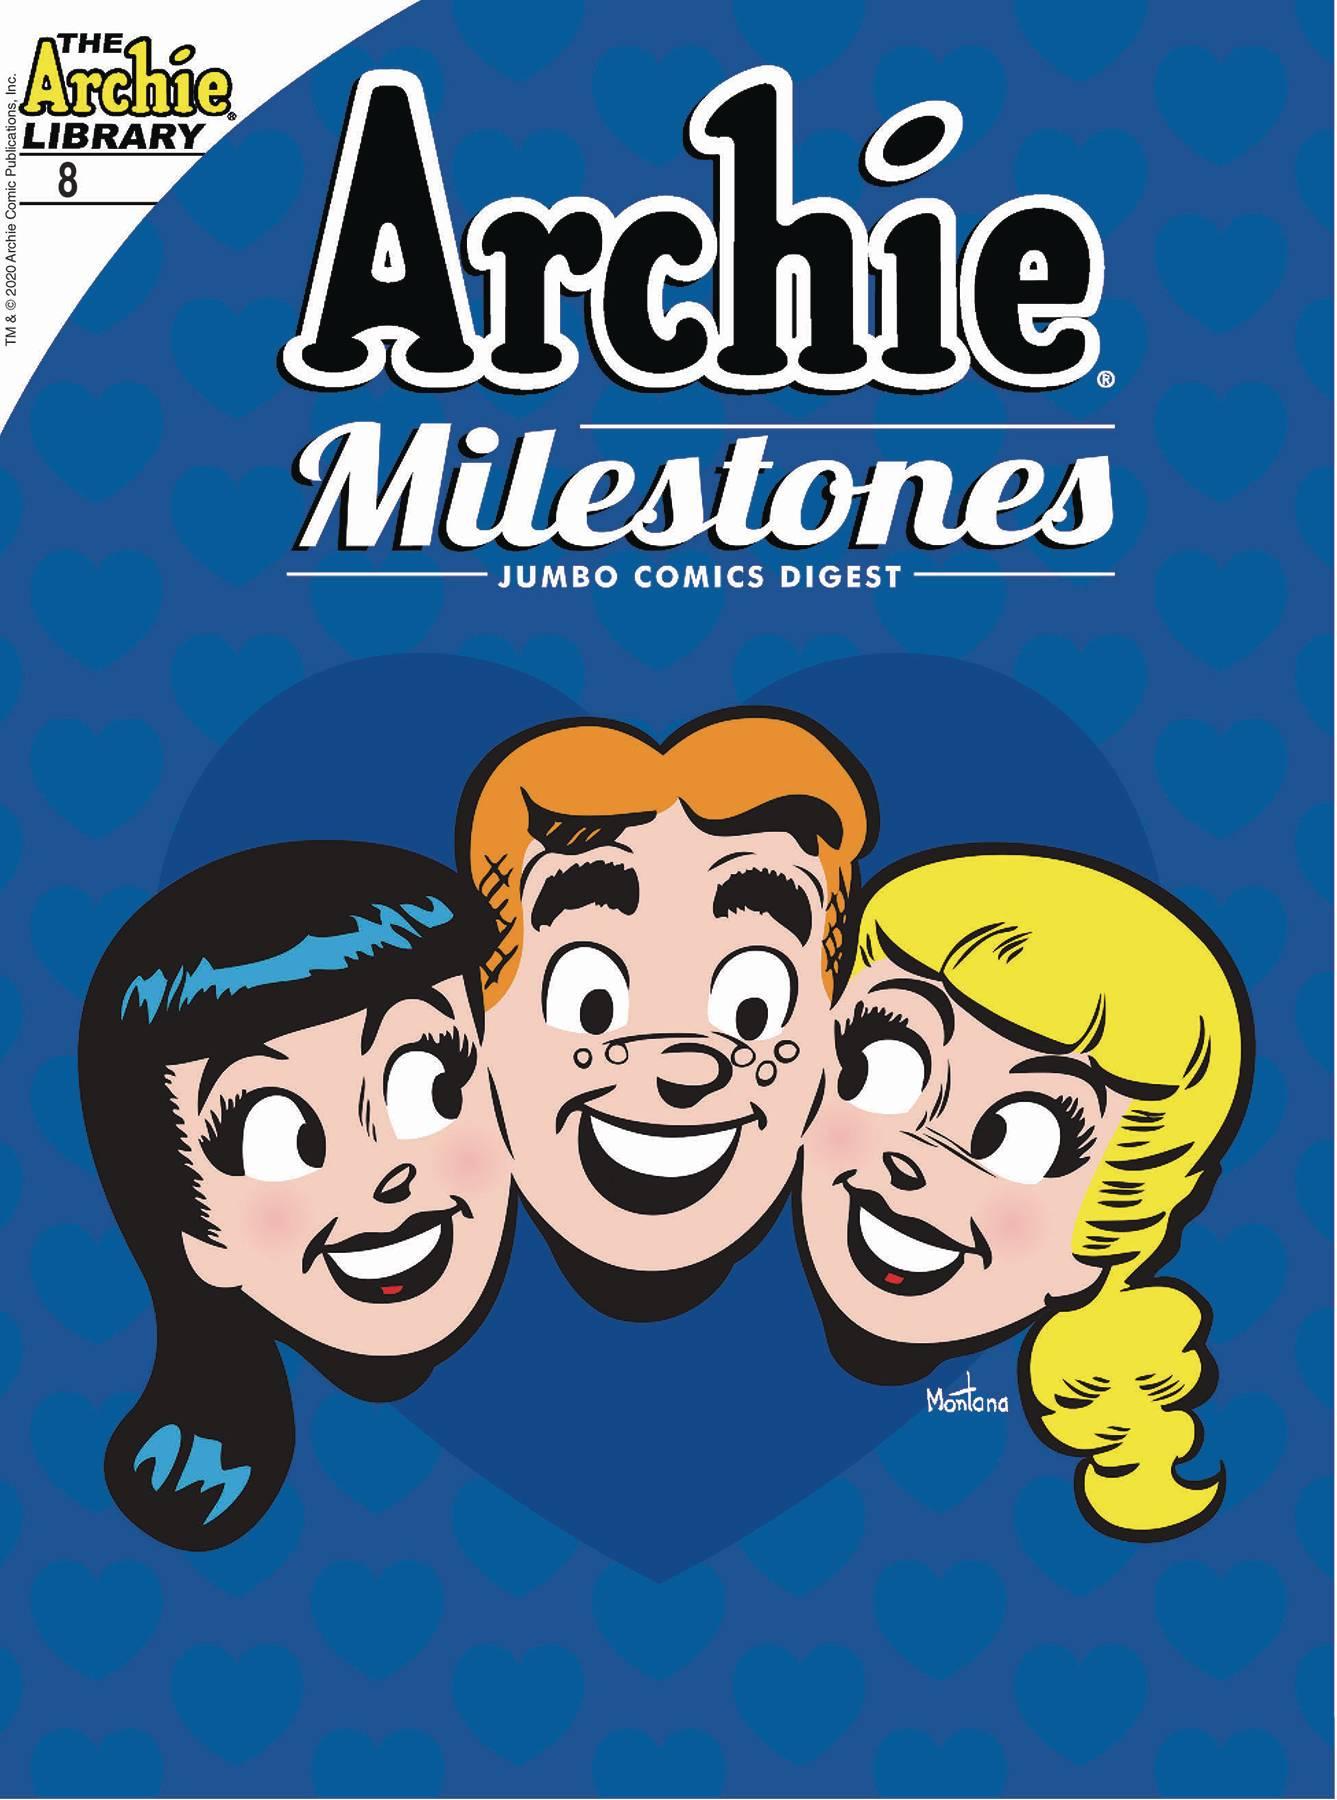 Archie Milestones Jumbo Comics Digest #8 (2020)